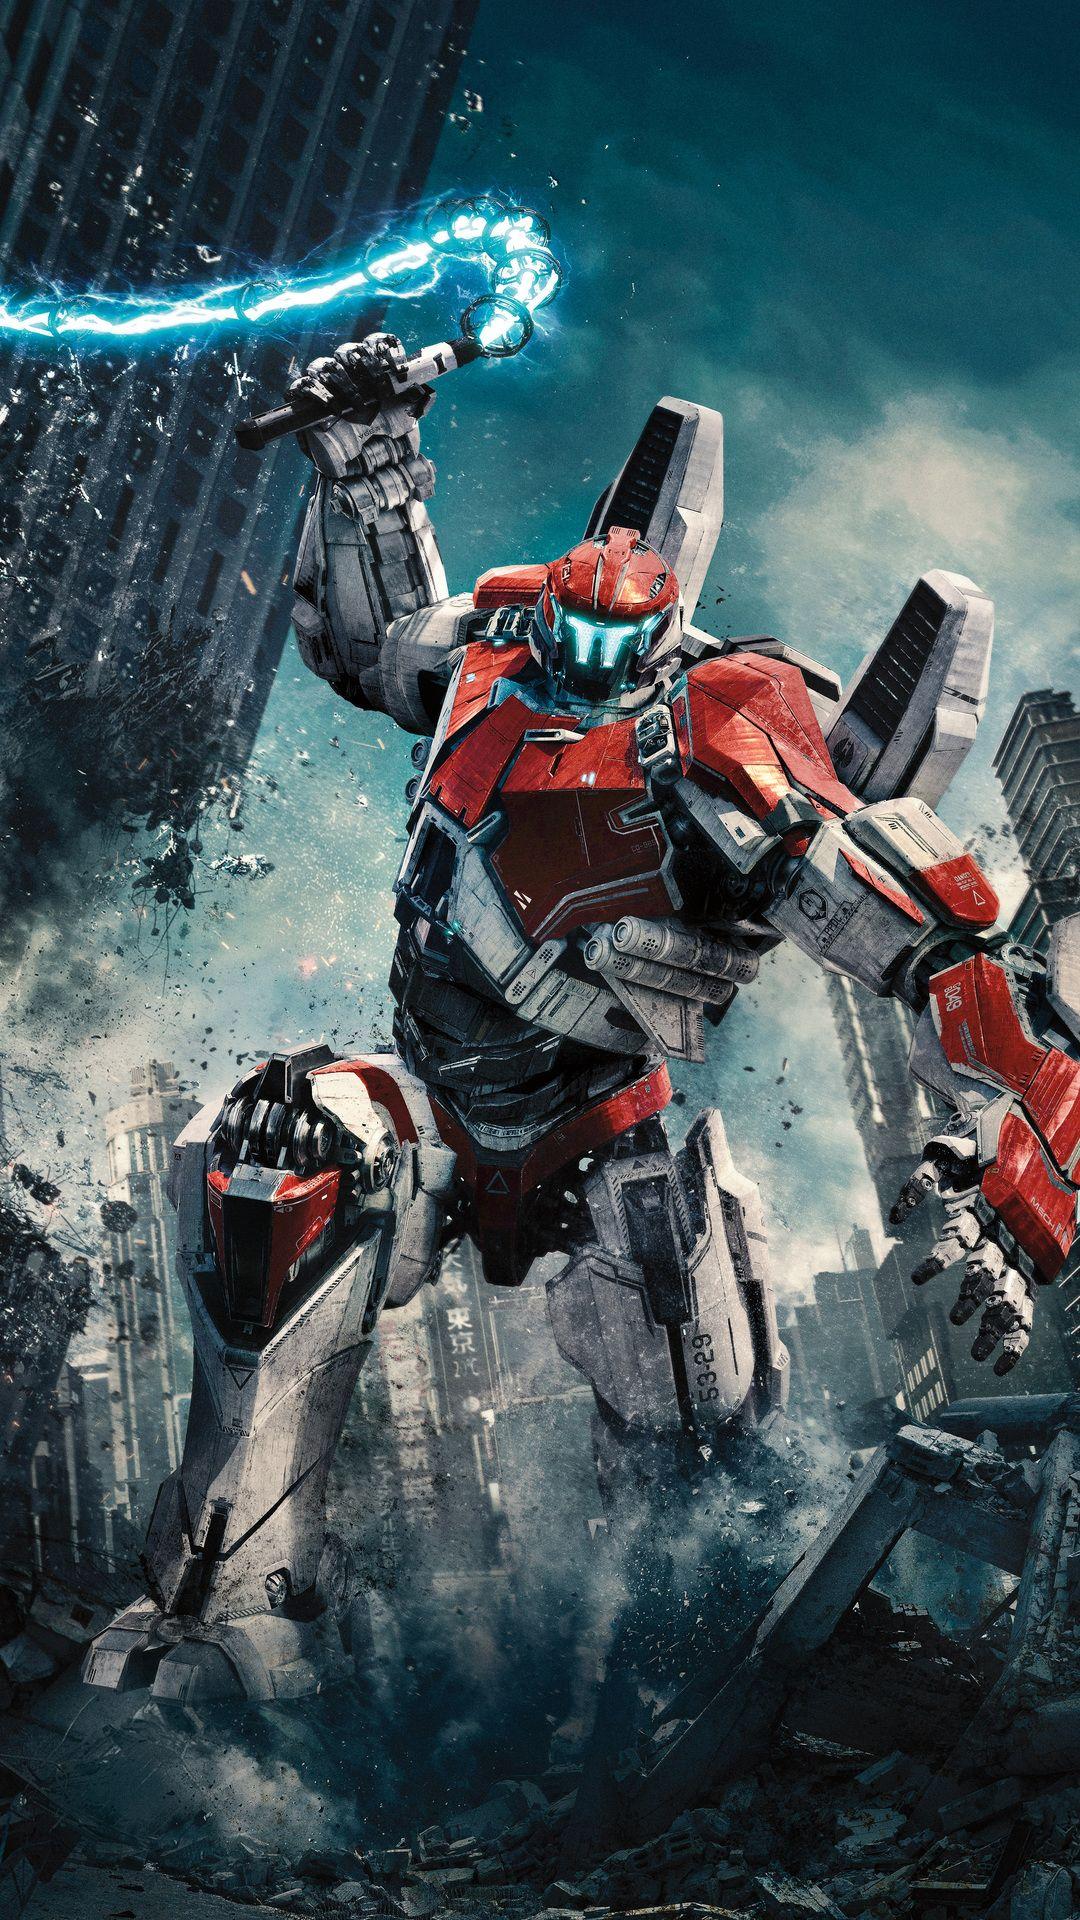 Pacific Rim Uprising Robot Spirits Guardian Bravo | HTC ... Pacific Rim